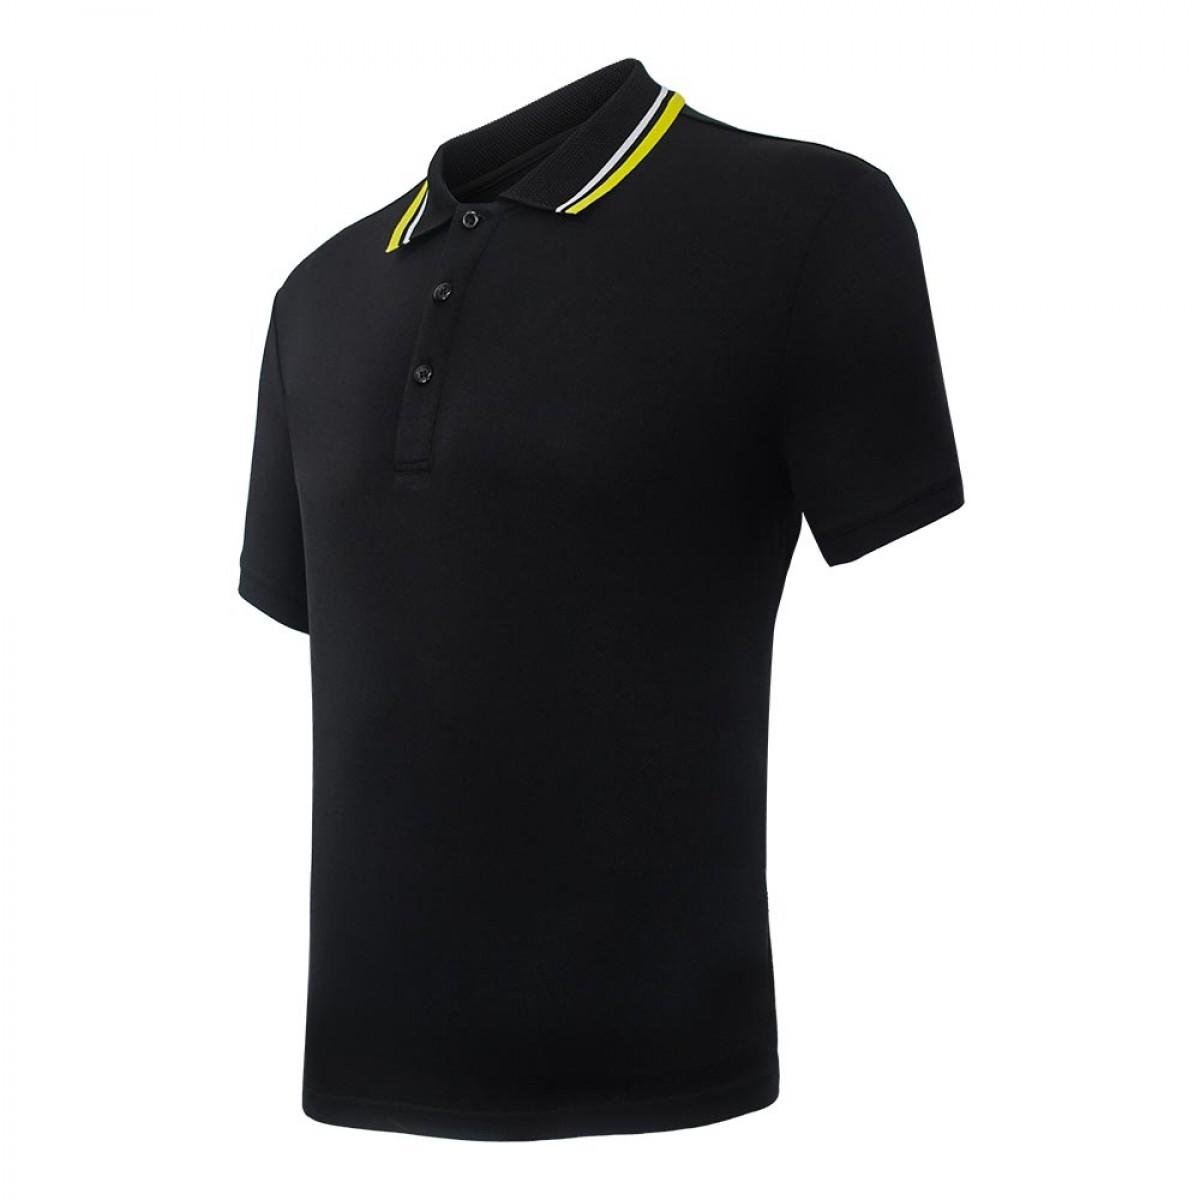 men-knit-polo-t-shirt-kkpt15144-8a